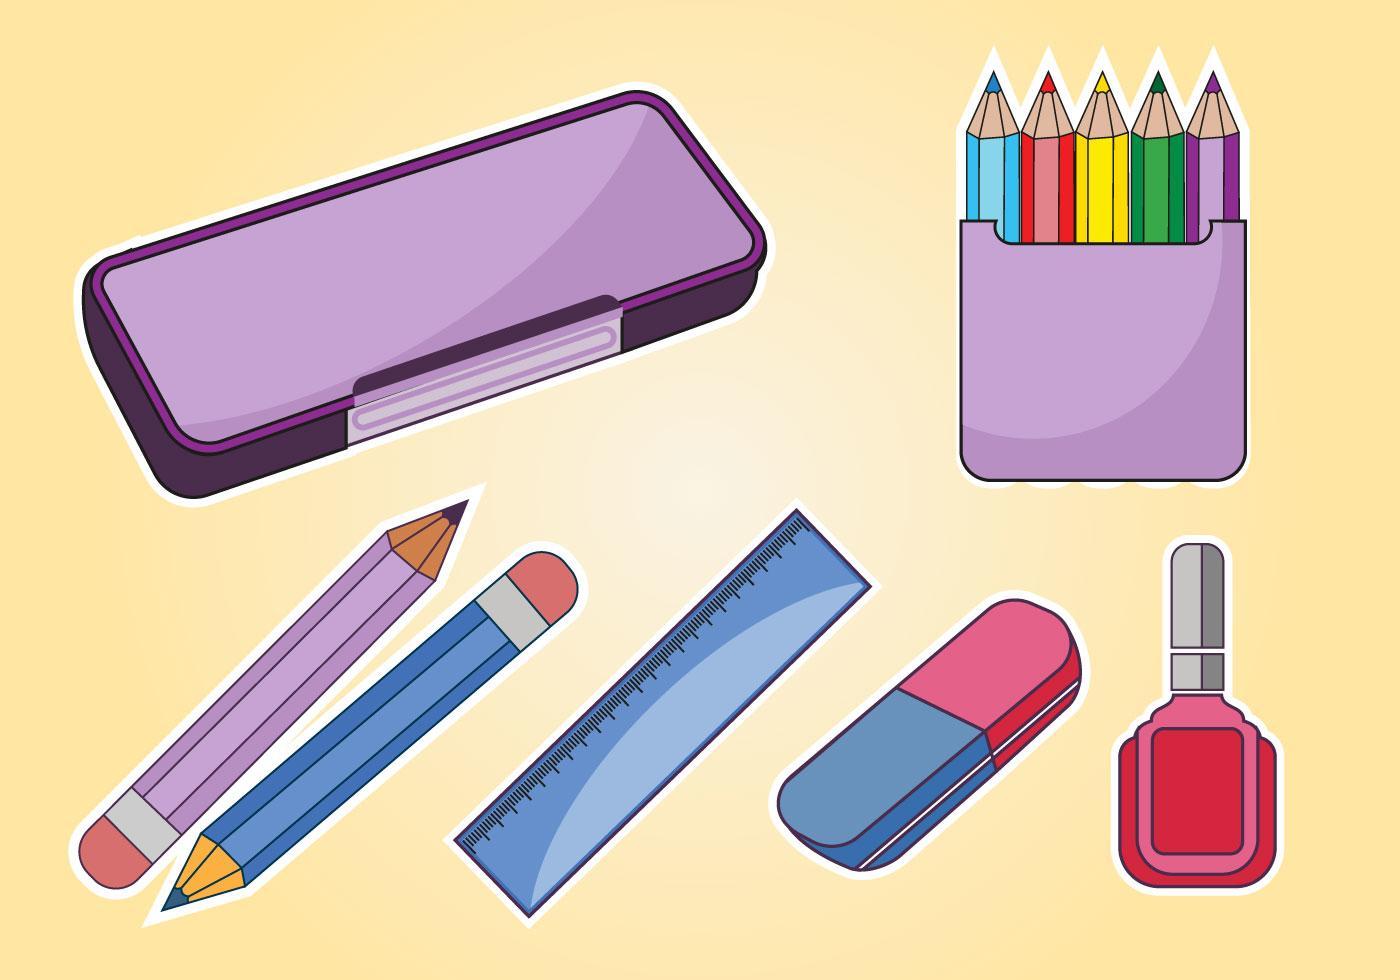 Карандаш ручка пенал картинки